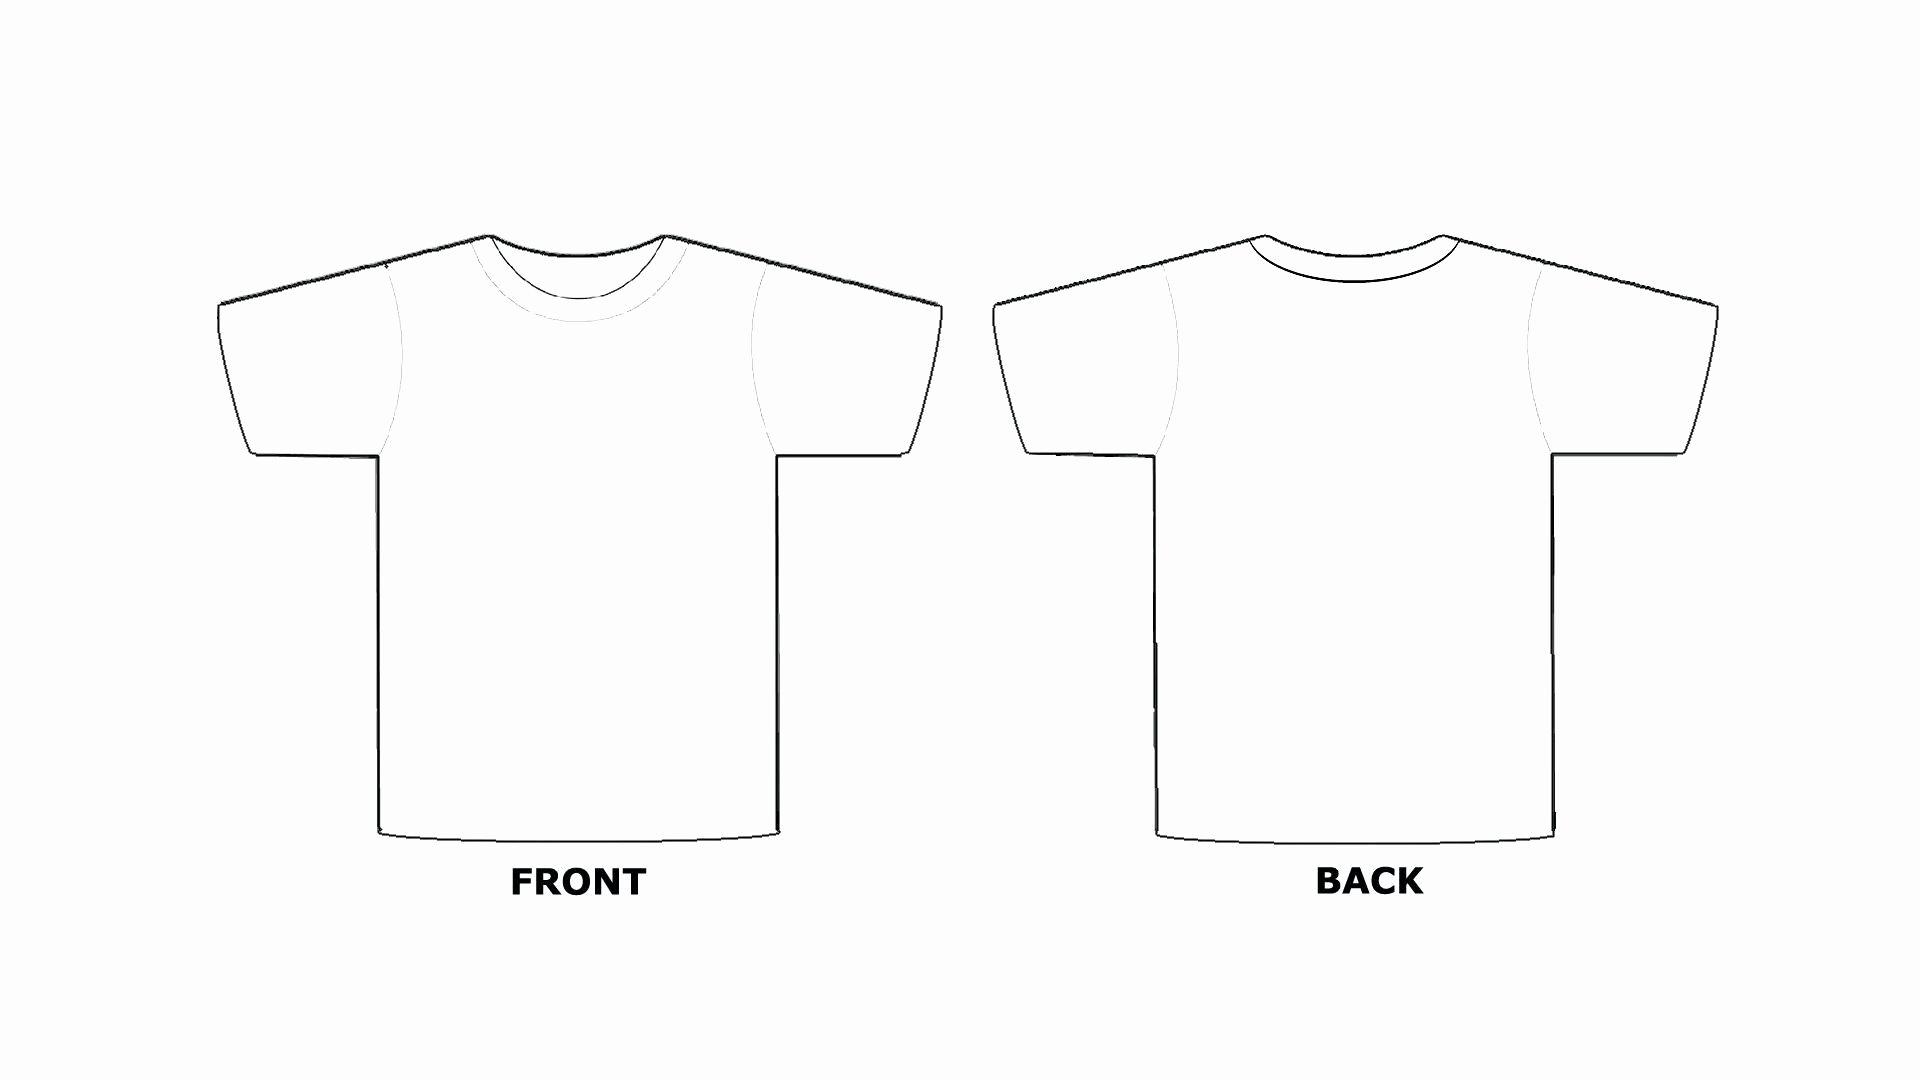 Blank Tshirt Template Unique Blank Tee Shirt Template – Emmamcintyrephotography